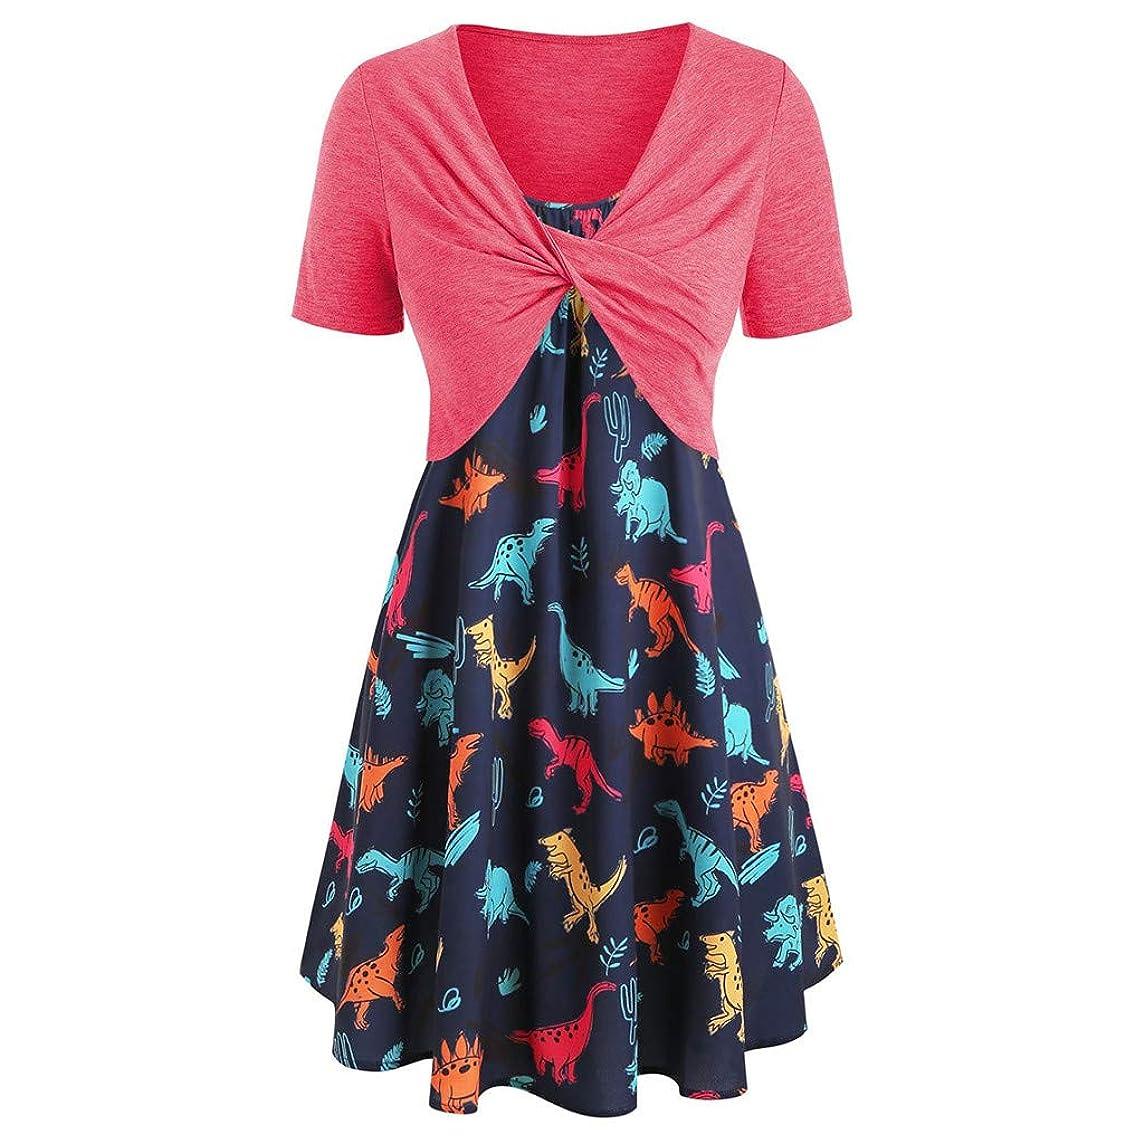 Haalife??Women's Summer Dress Casual Short Sleeve Bandage Top Sunflower Print Maxi Dress Boho Spaghetti Strap Dress